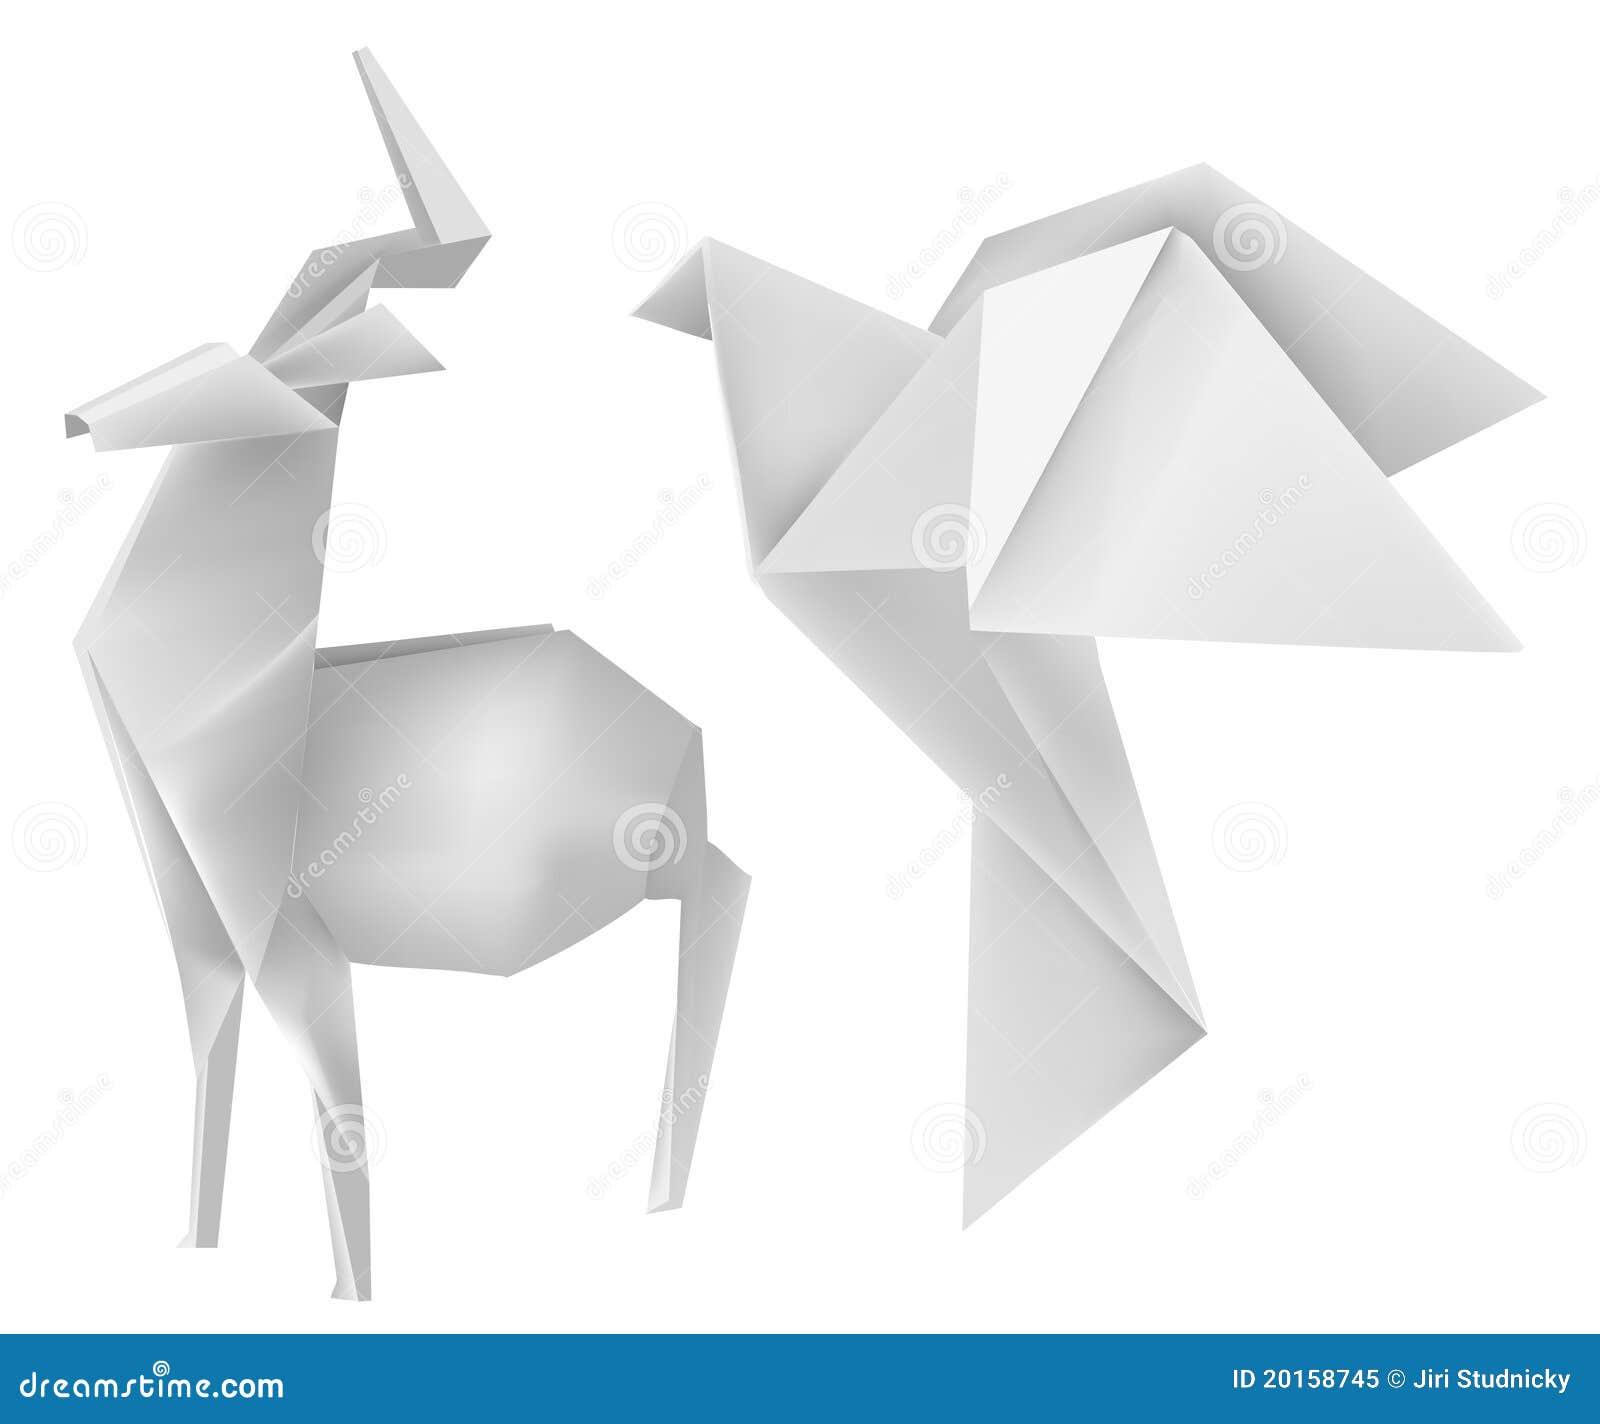 Origami_deer_dove Royalty Free Stock Photo - Image: 20158745 - photo#37